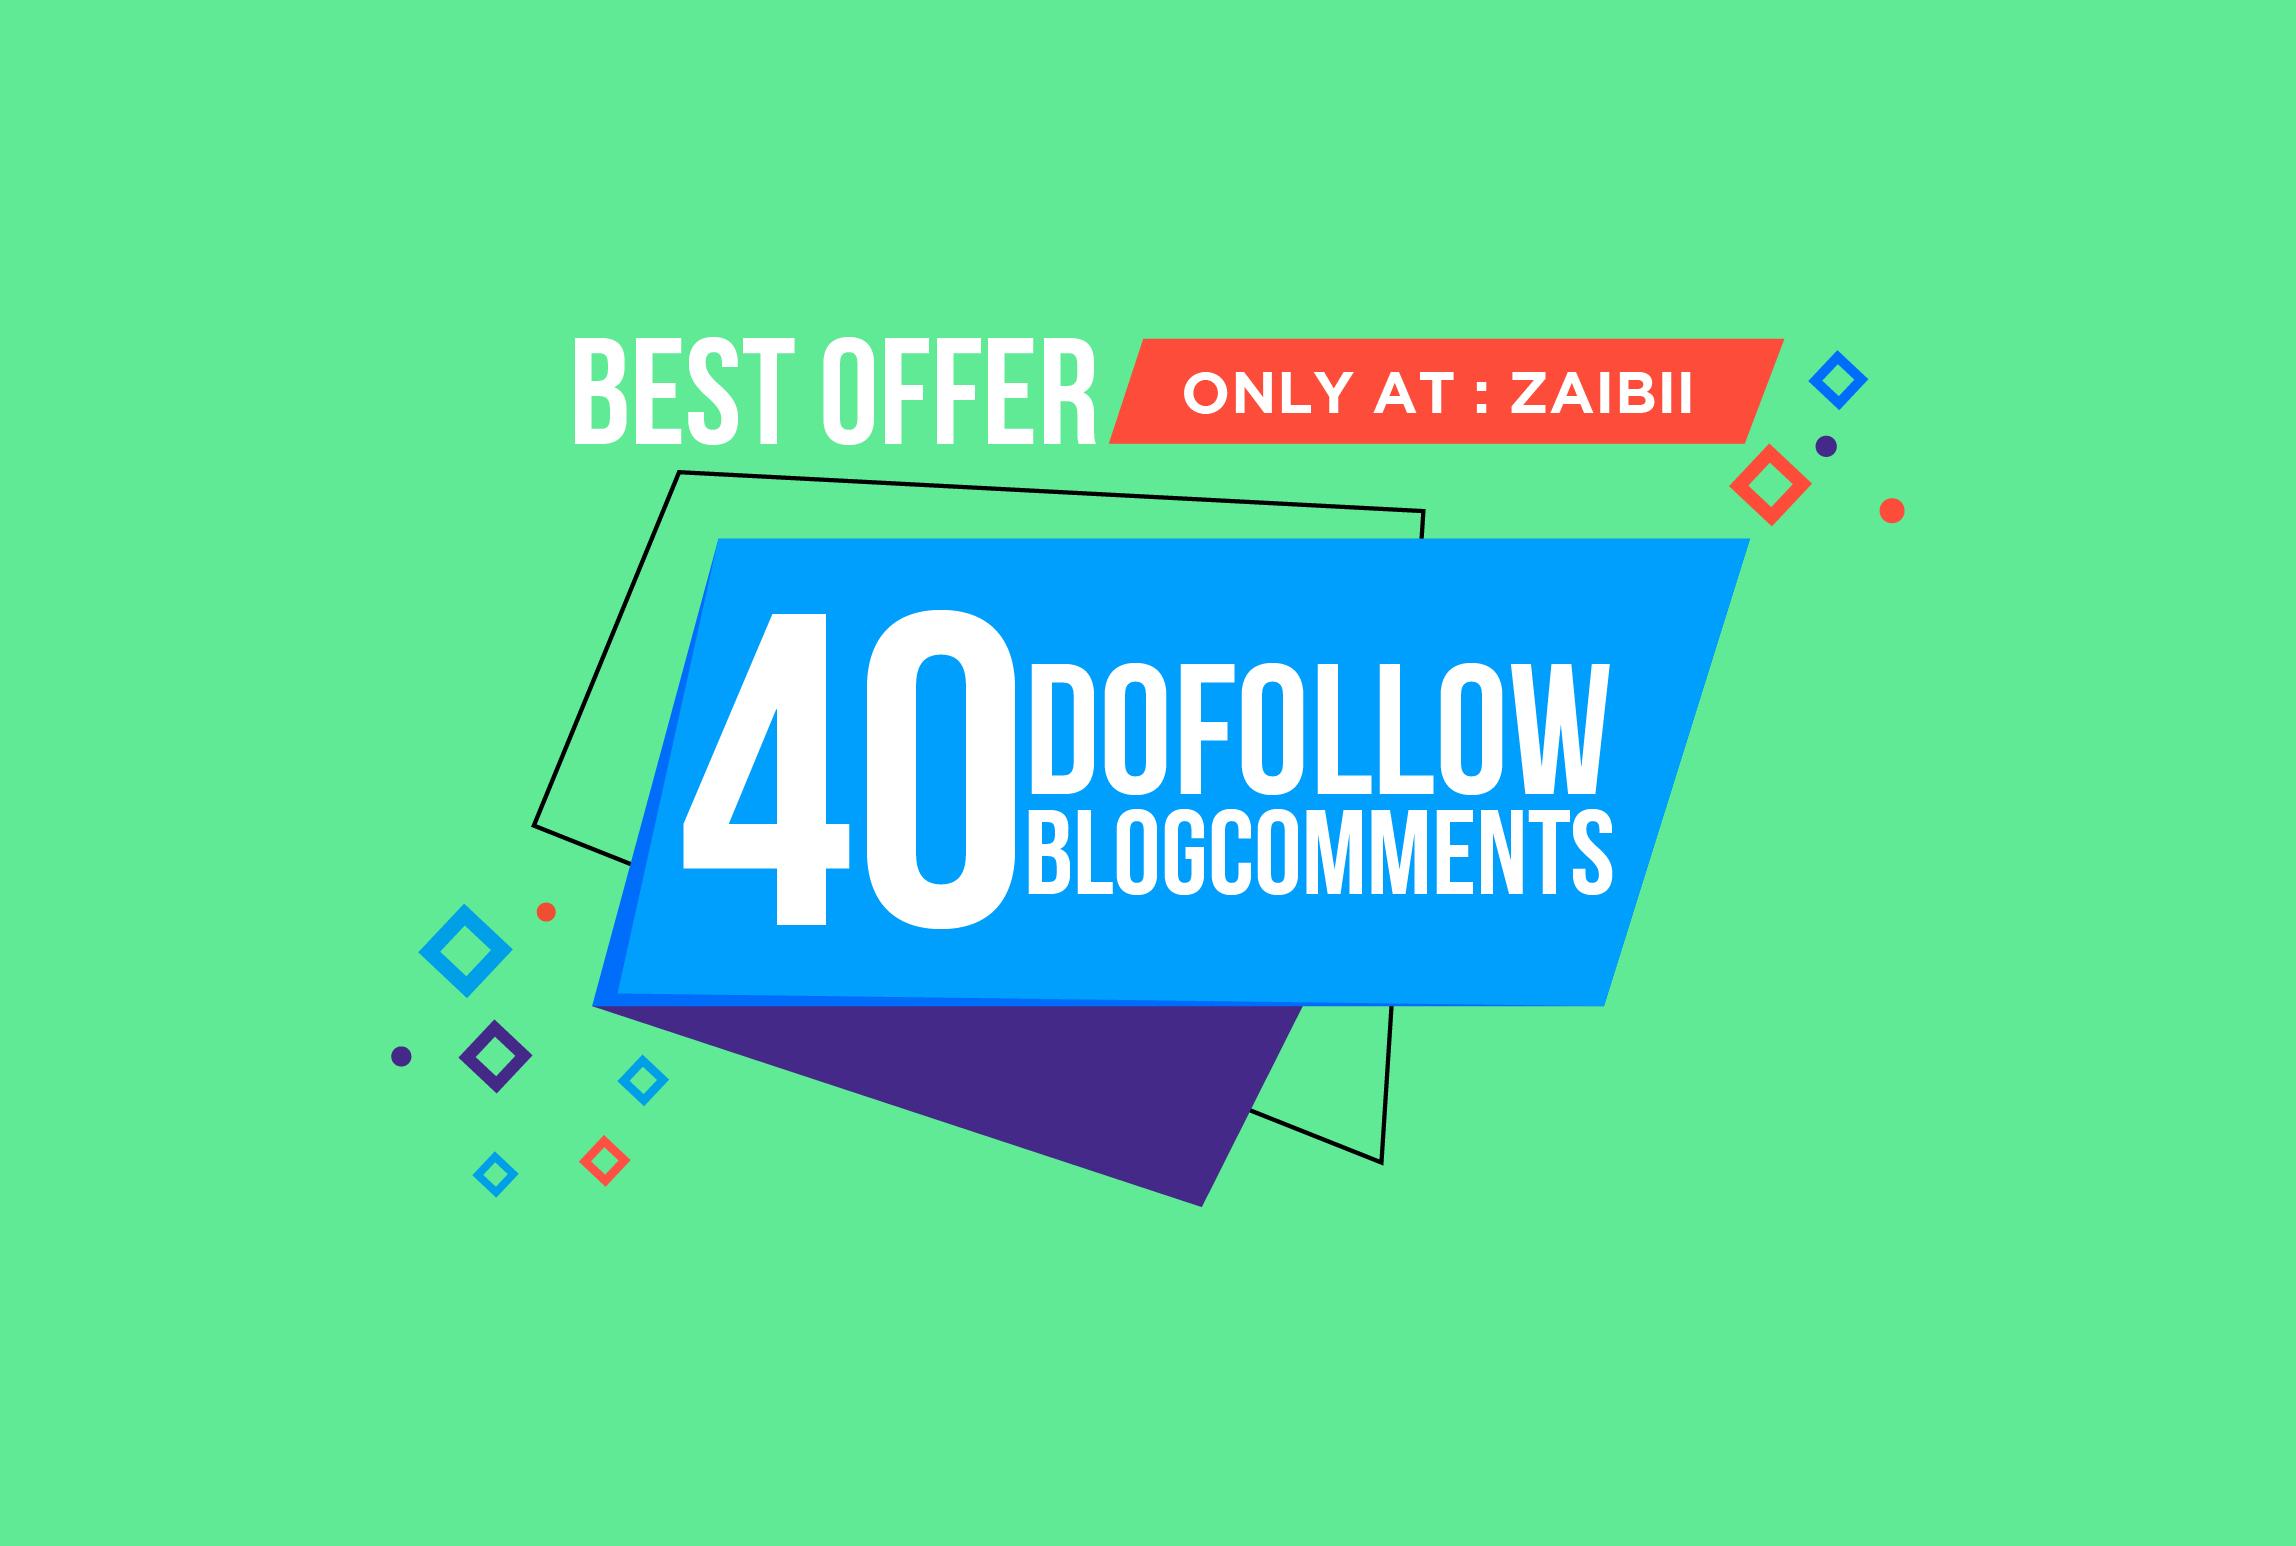 40 manual Dofollow Blogcomment on High DA PA Backlinks